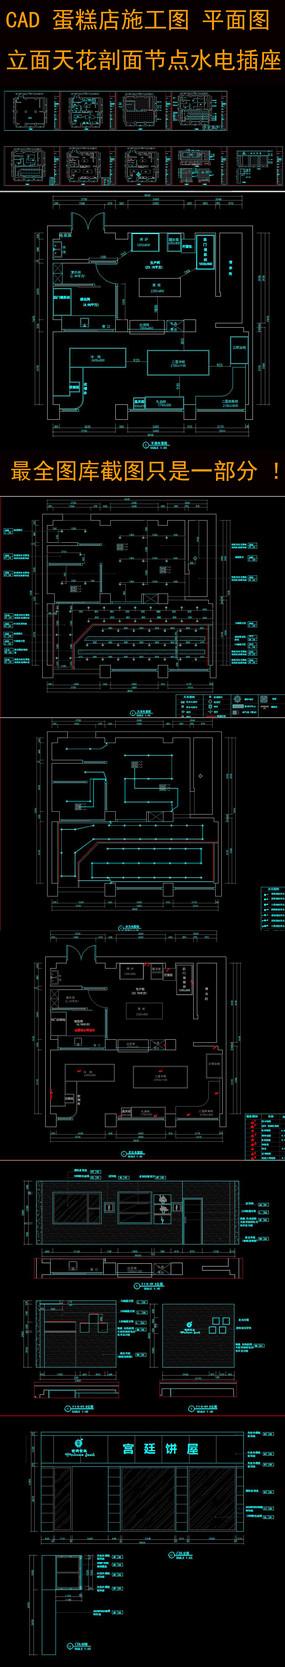 CAD蛋糕店装修设计施工图 dwg